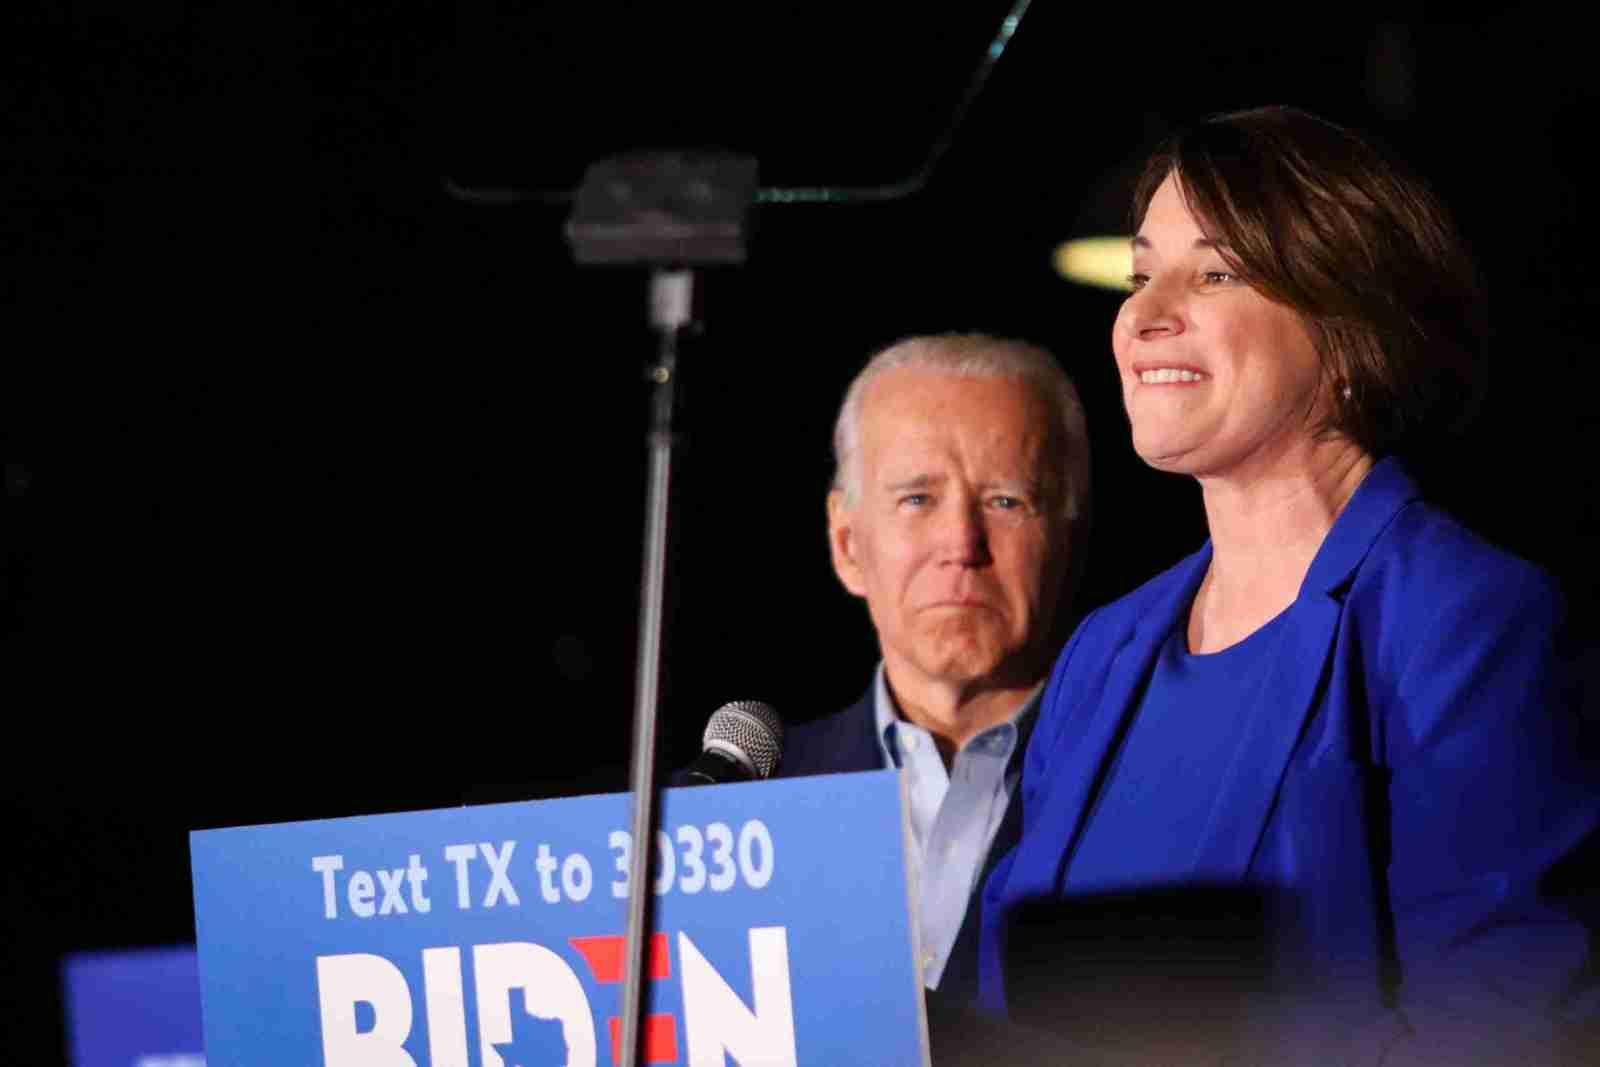 Amy Klobuchar Drops Out of Presidential Race Endorsing Biden 7